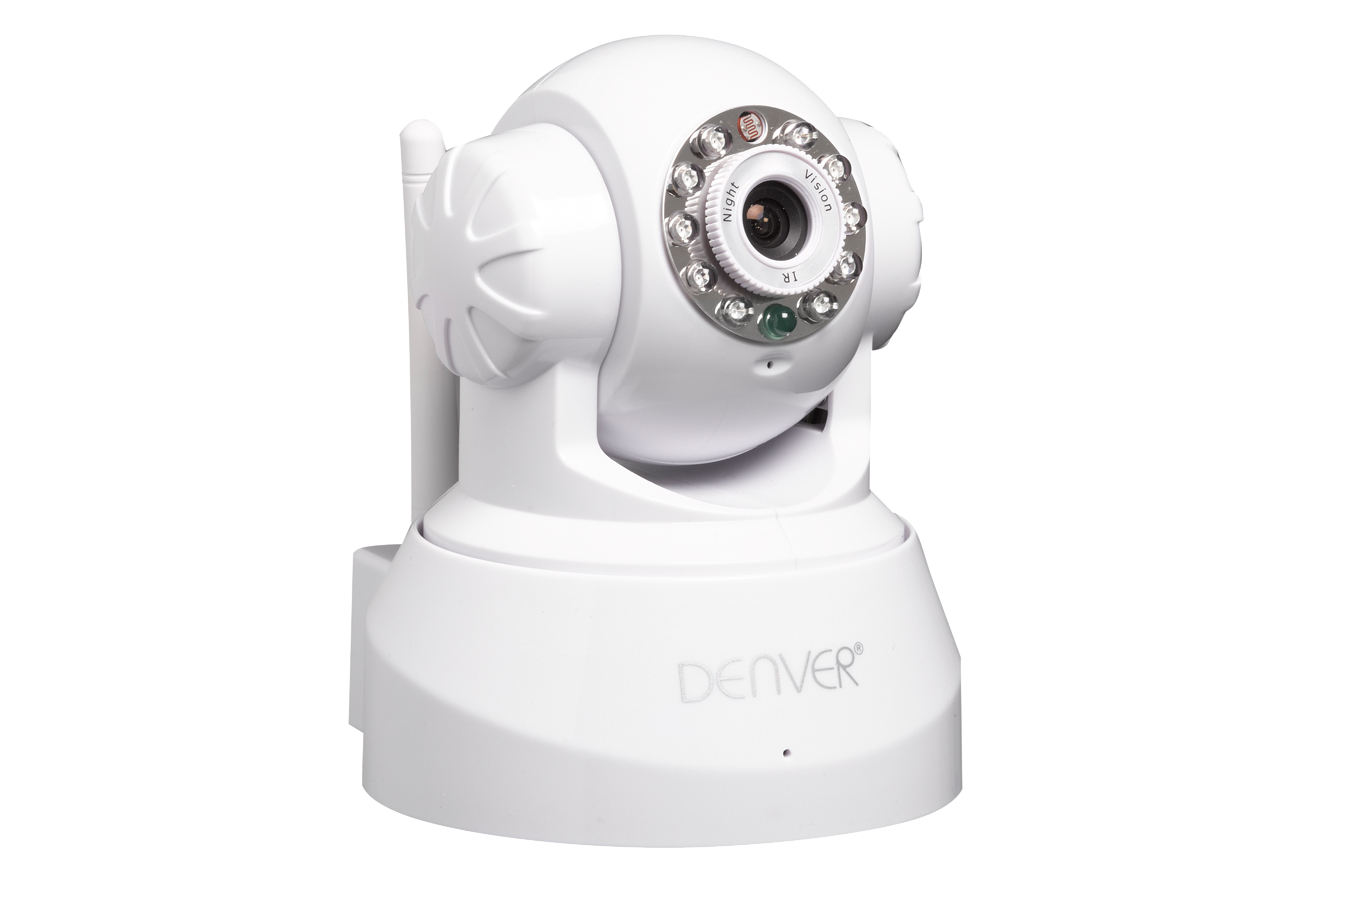 Denver kamera ipo 320